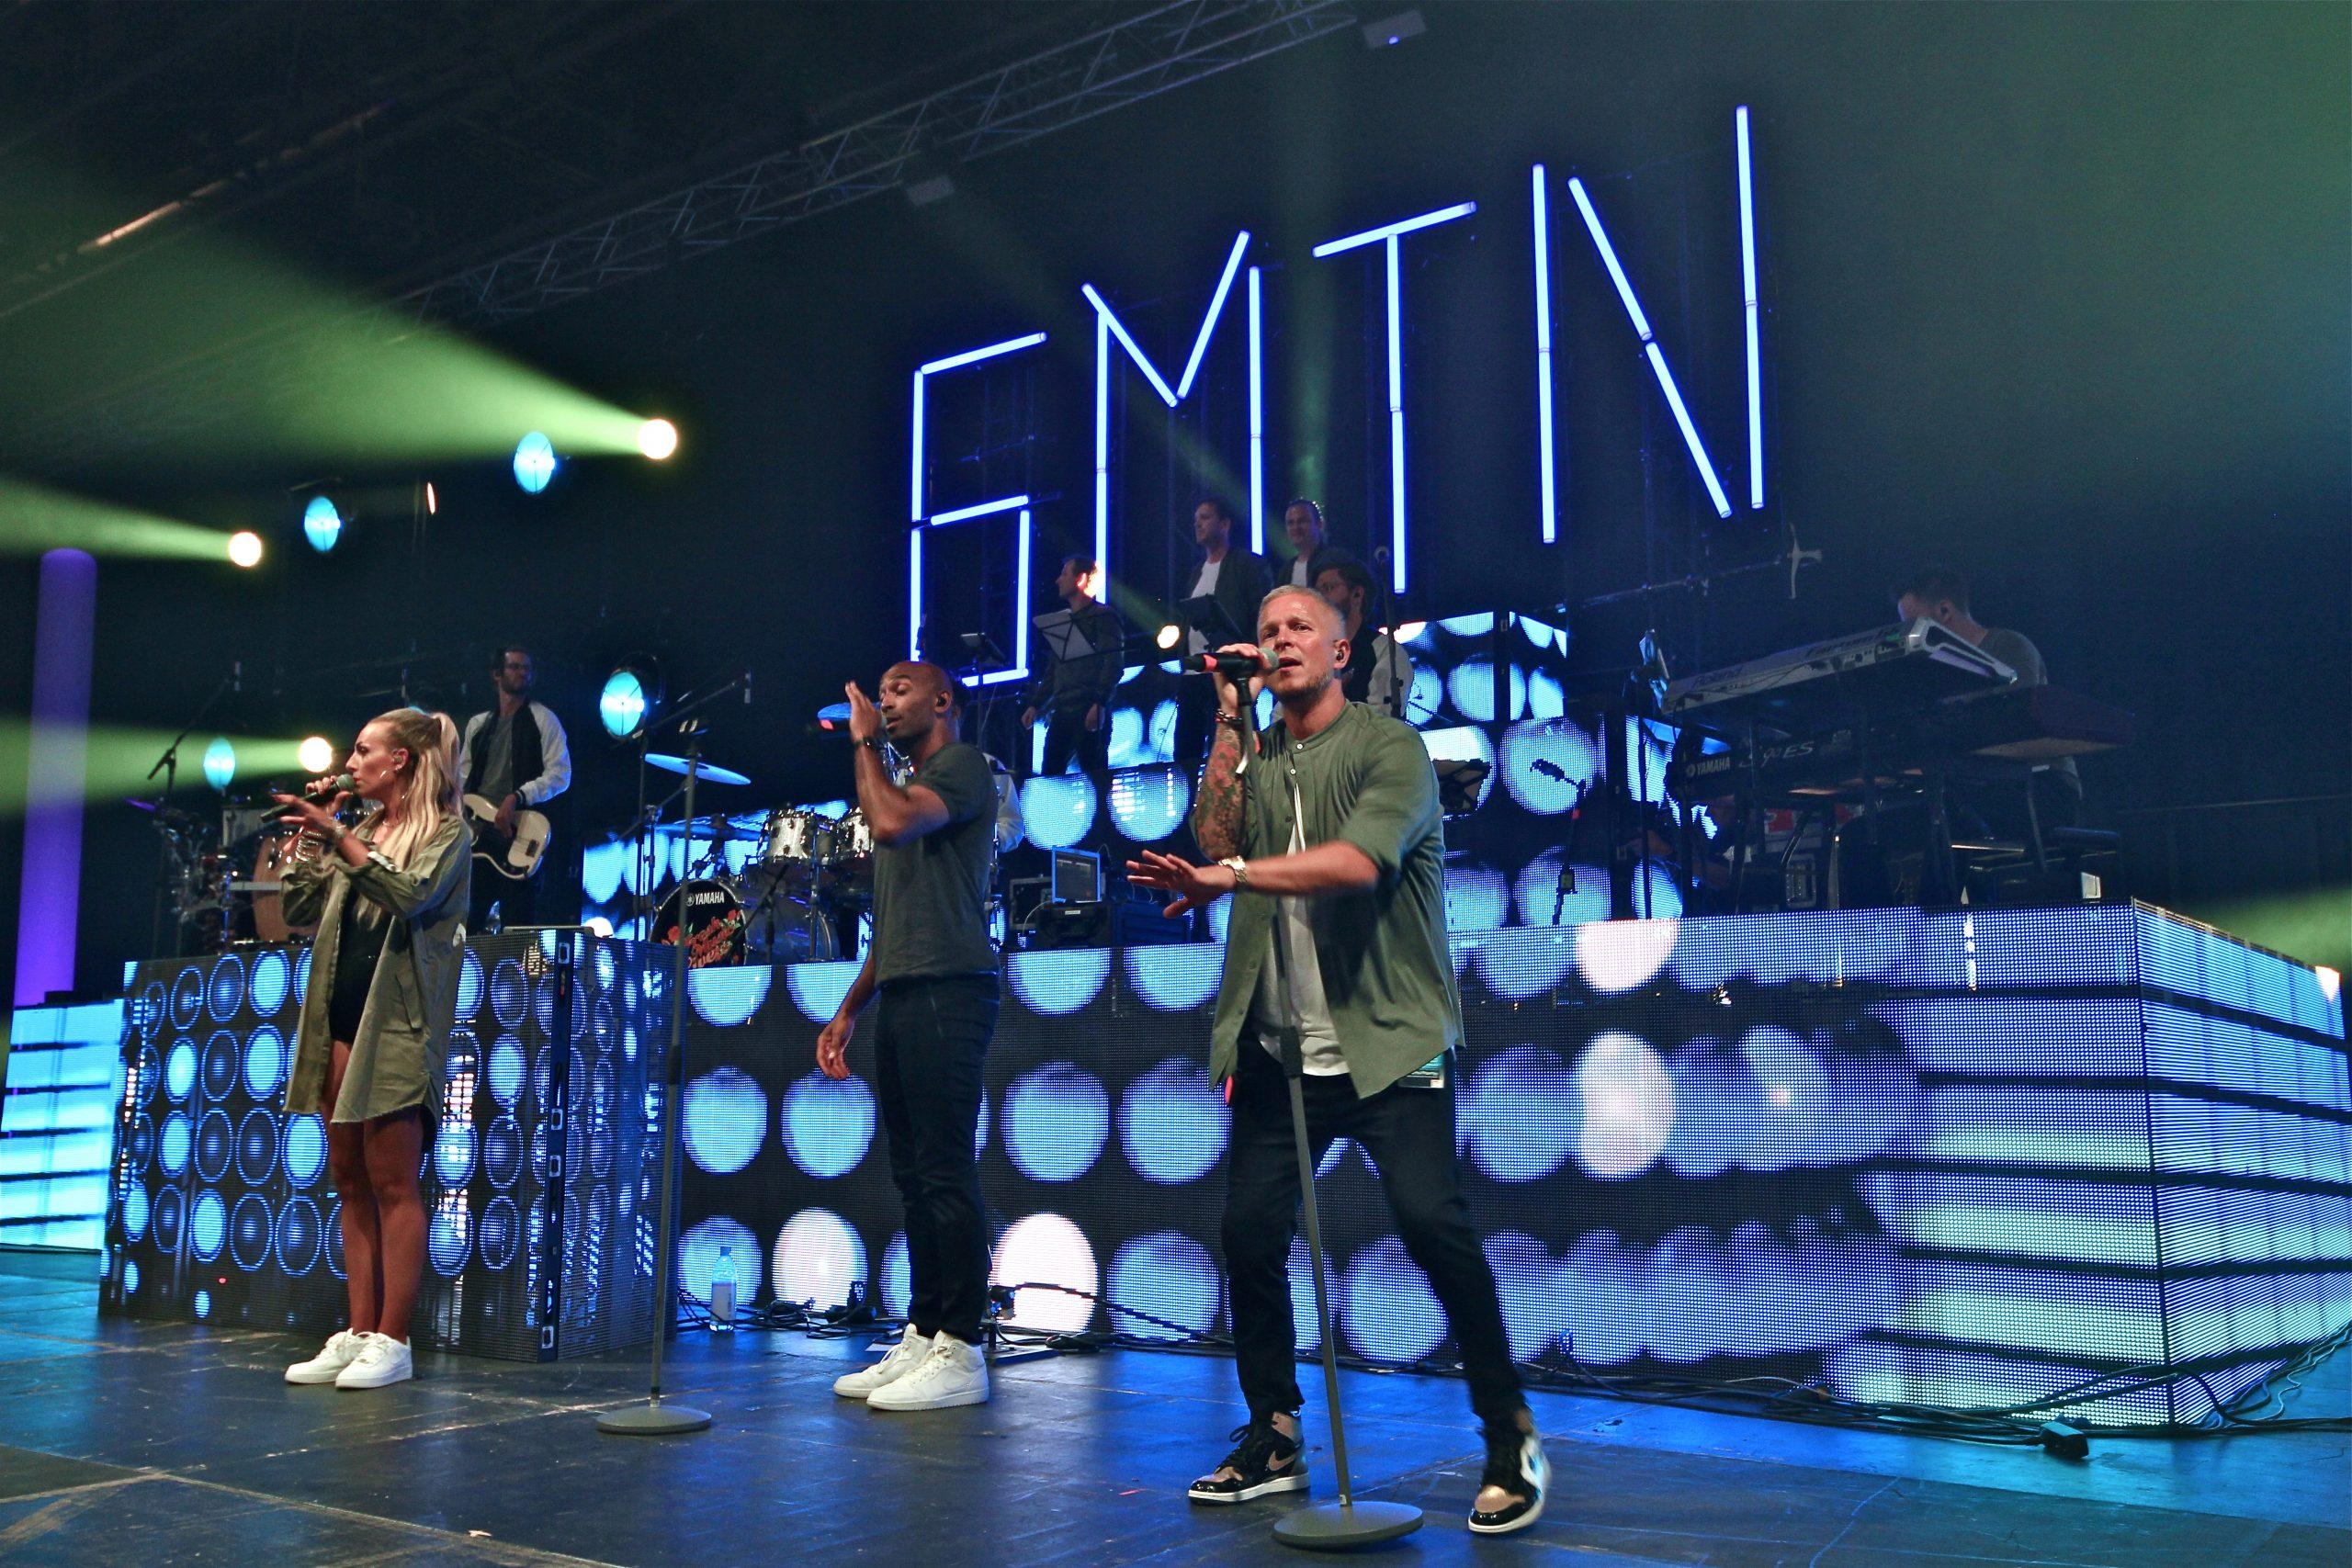 FRESH-MUSIC-LIVE_GMTN-MESSE